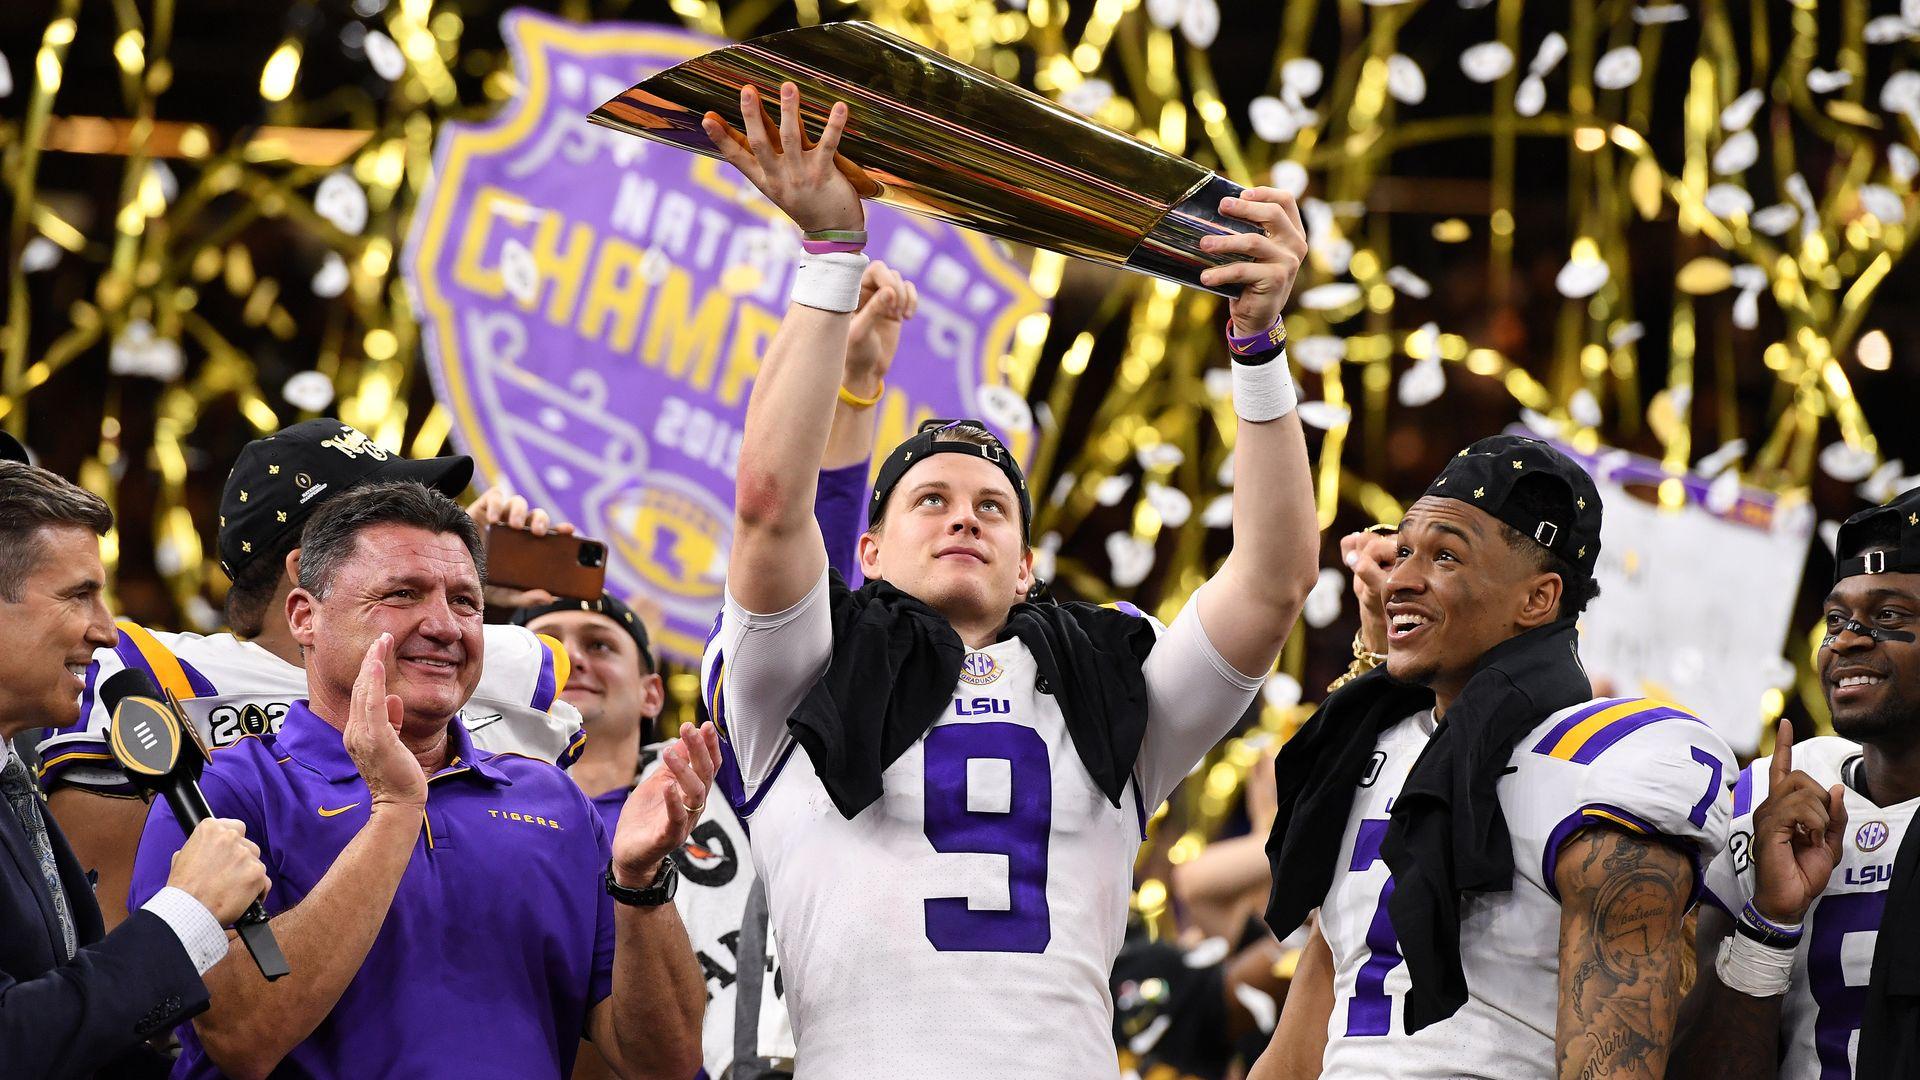 Joe Burrow holding up the trophy